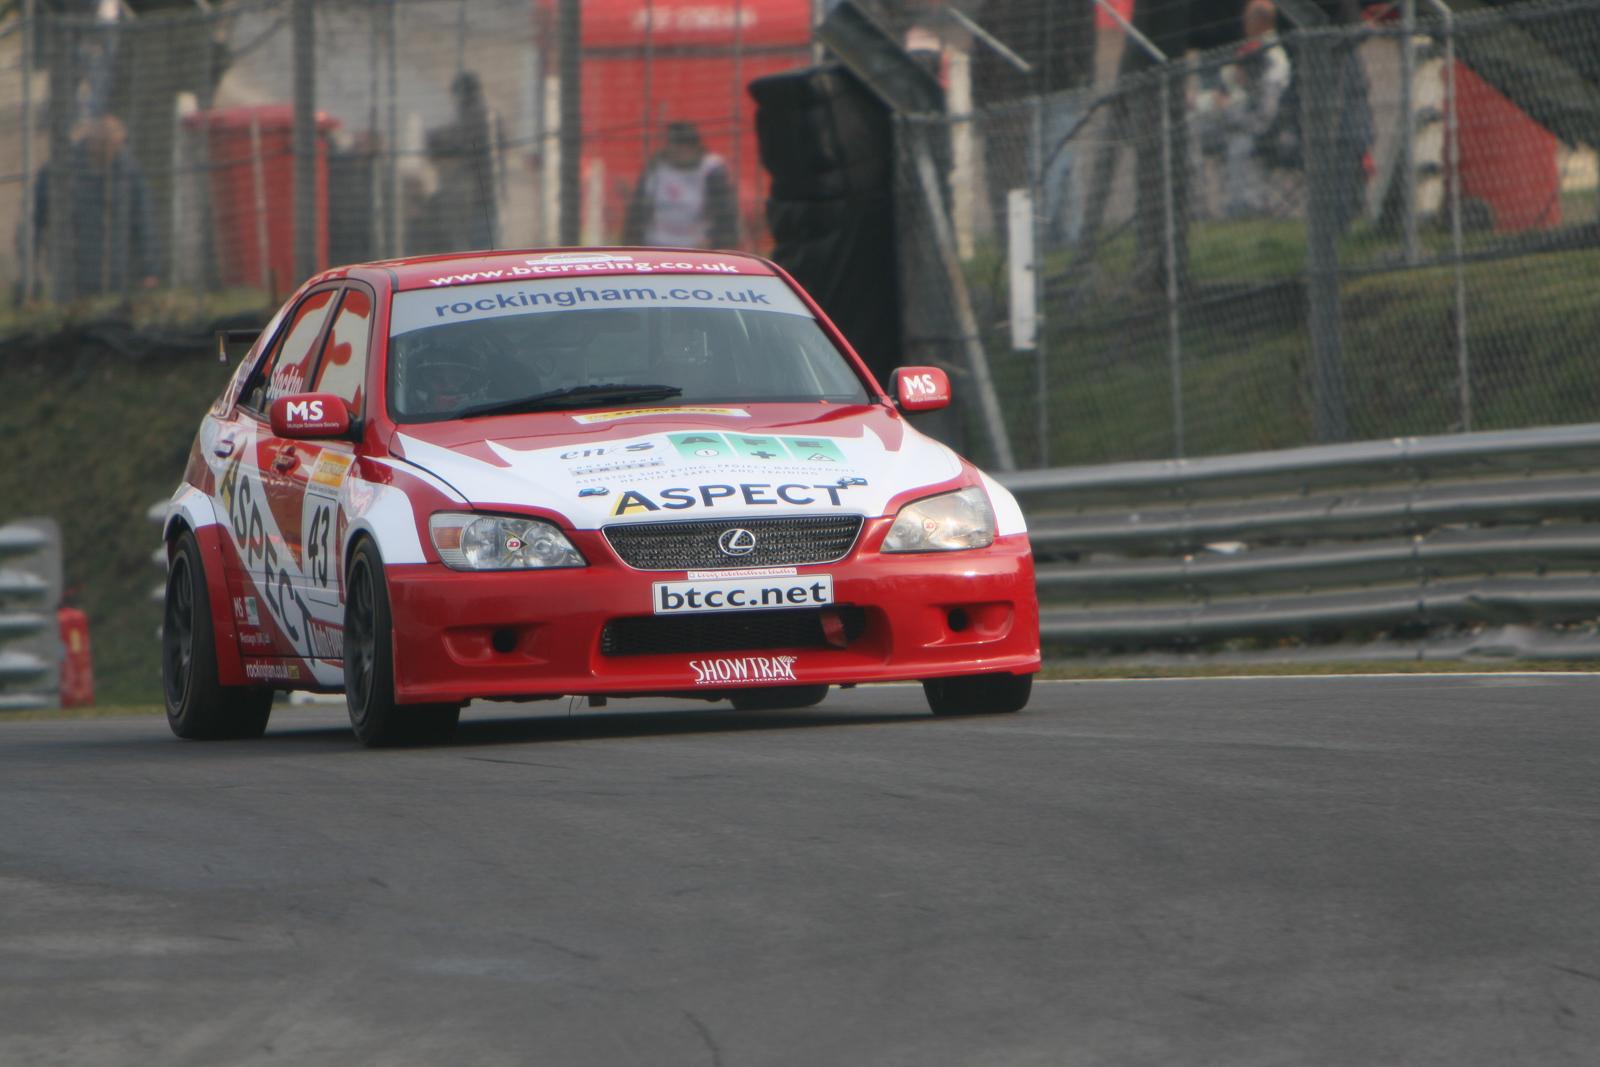 20070331 - BTCC Brands -070331 -005